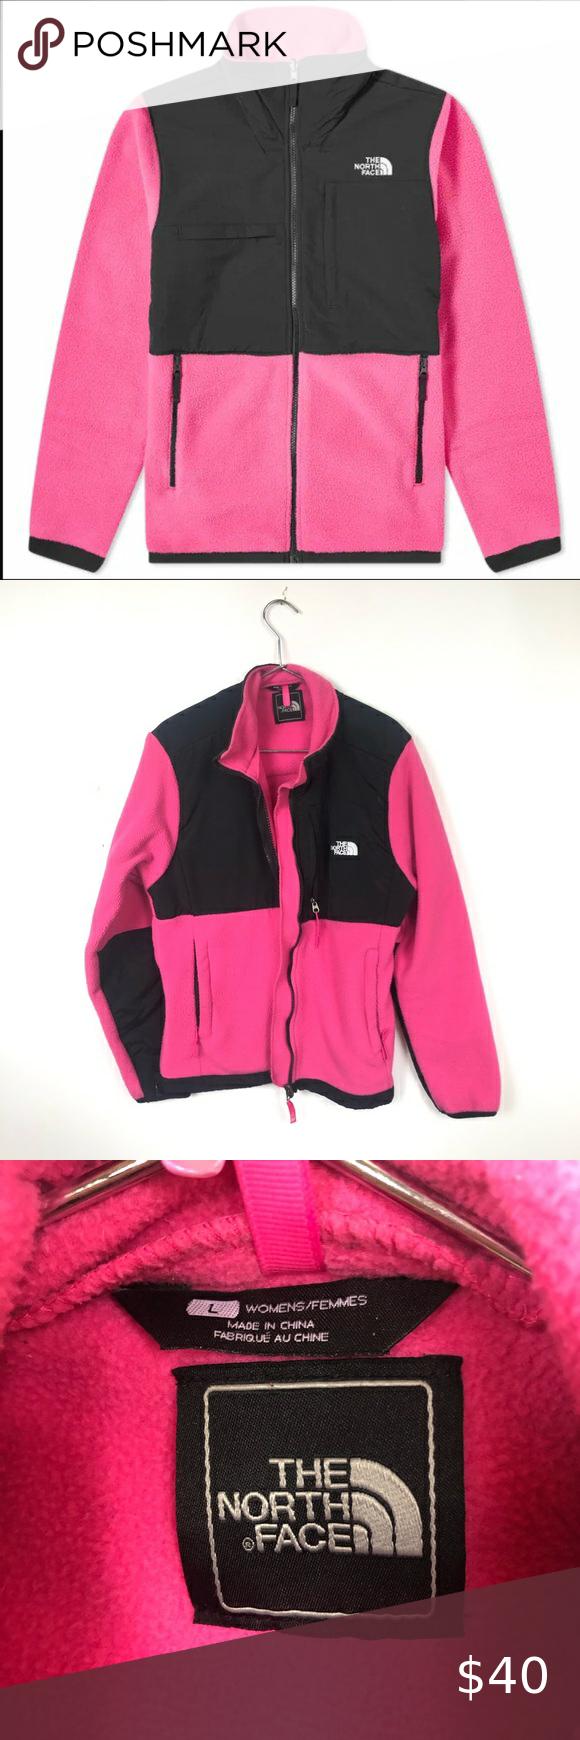 The North Face Denali 2 Black Pink Fleece Jacket Fleece Jacket Womens Fleece Jacket North Face Jacket [ 1740 x 580 Pixel ]